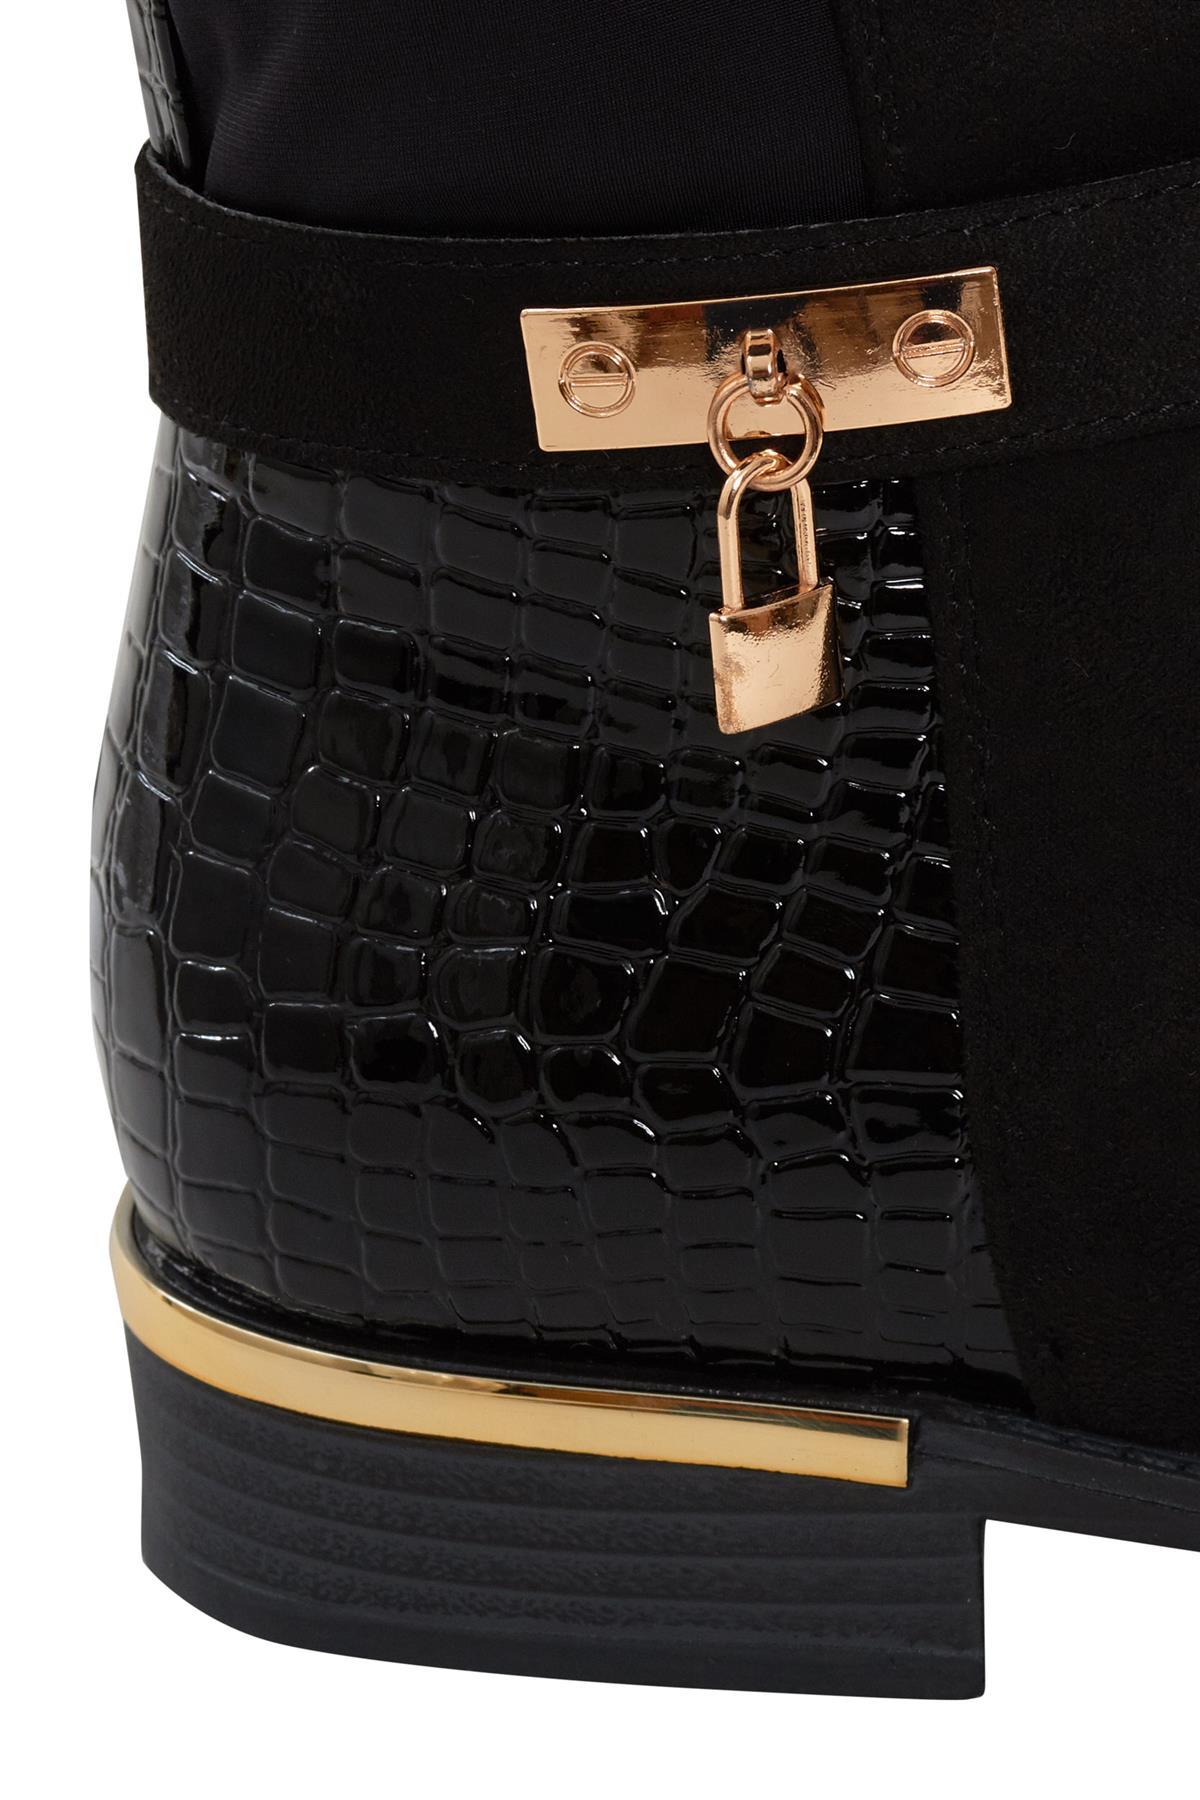 Womens-Ladies-Knee-High-Gold-Detail-Low-Block-Heel-Zip-Up-PU-Suede-Black-Boots thumbnail 9